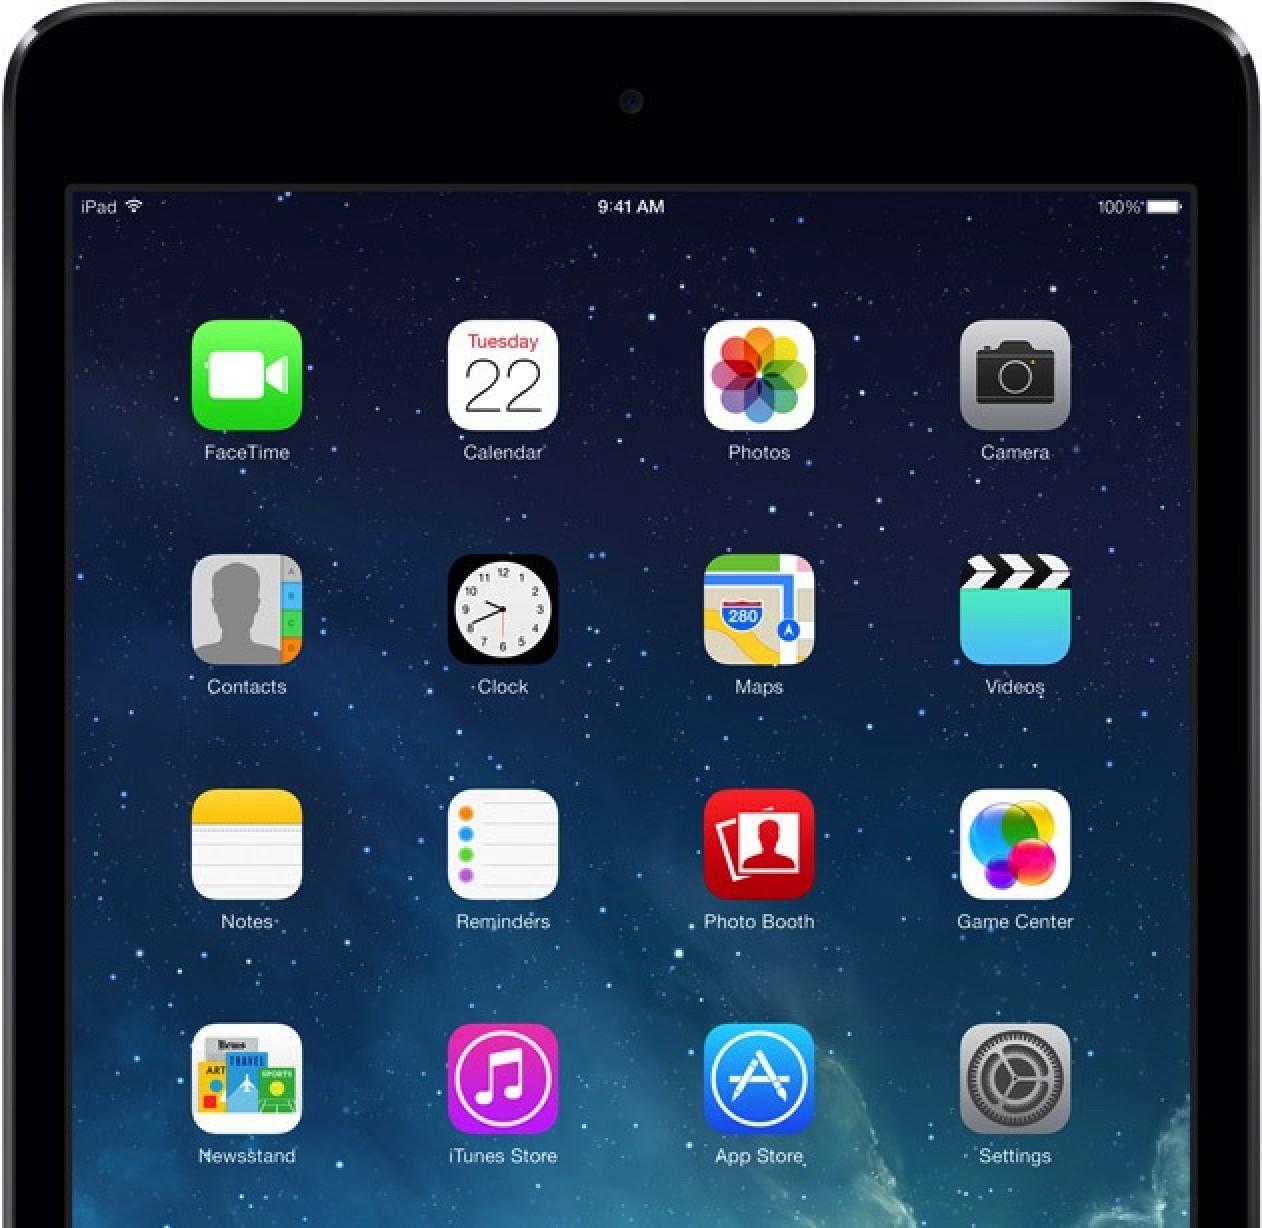 Black Friday Car Deals >> Black Friday 2013: Best Deals on the iPad, iPad Air, and iPad mini - Mac Rumors